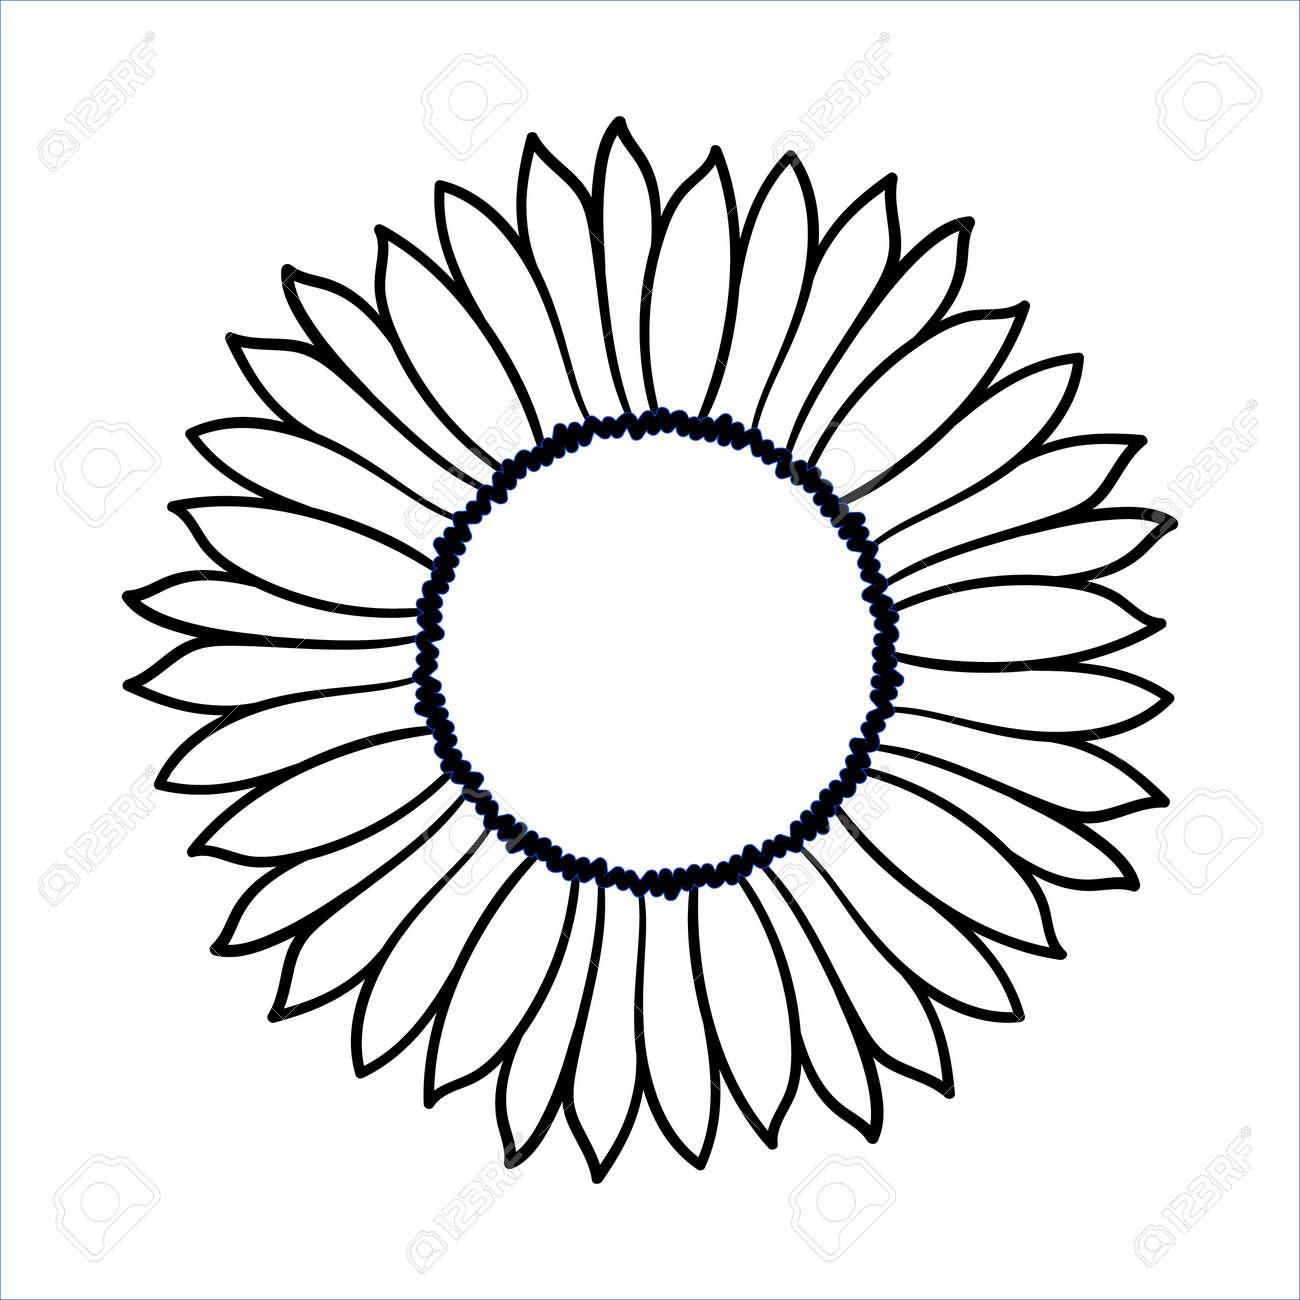 vector doodle sunflower illustration simple hand drawn icon rh 123rf com sunflower vector free download sunflower vector freepik